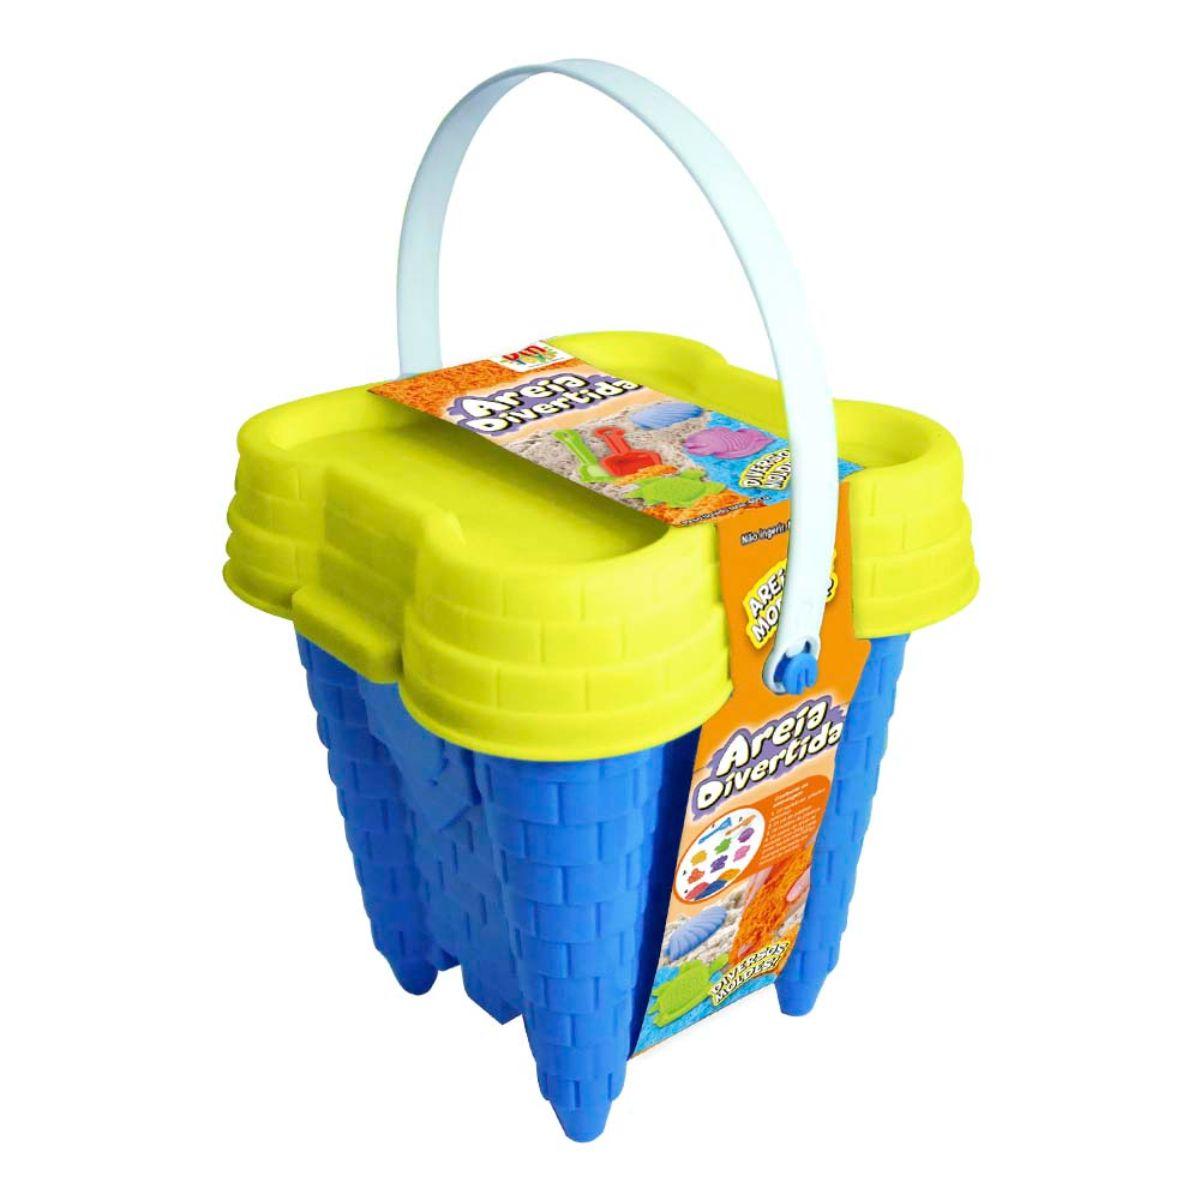 Areia Divertida Balde Castelo DM Toys Infantil